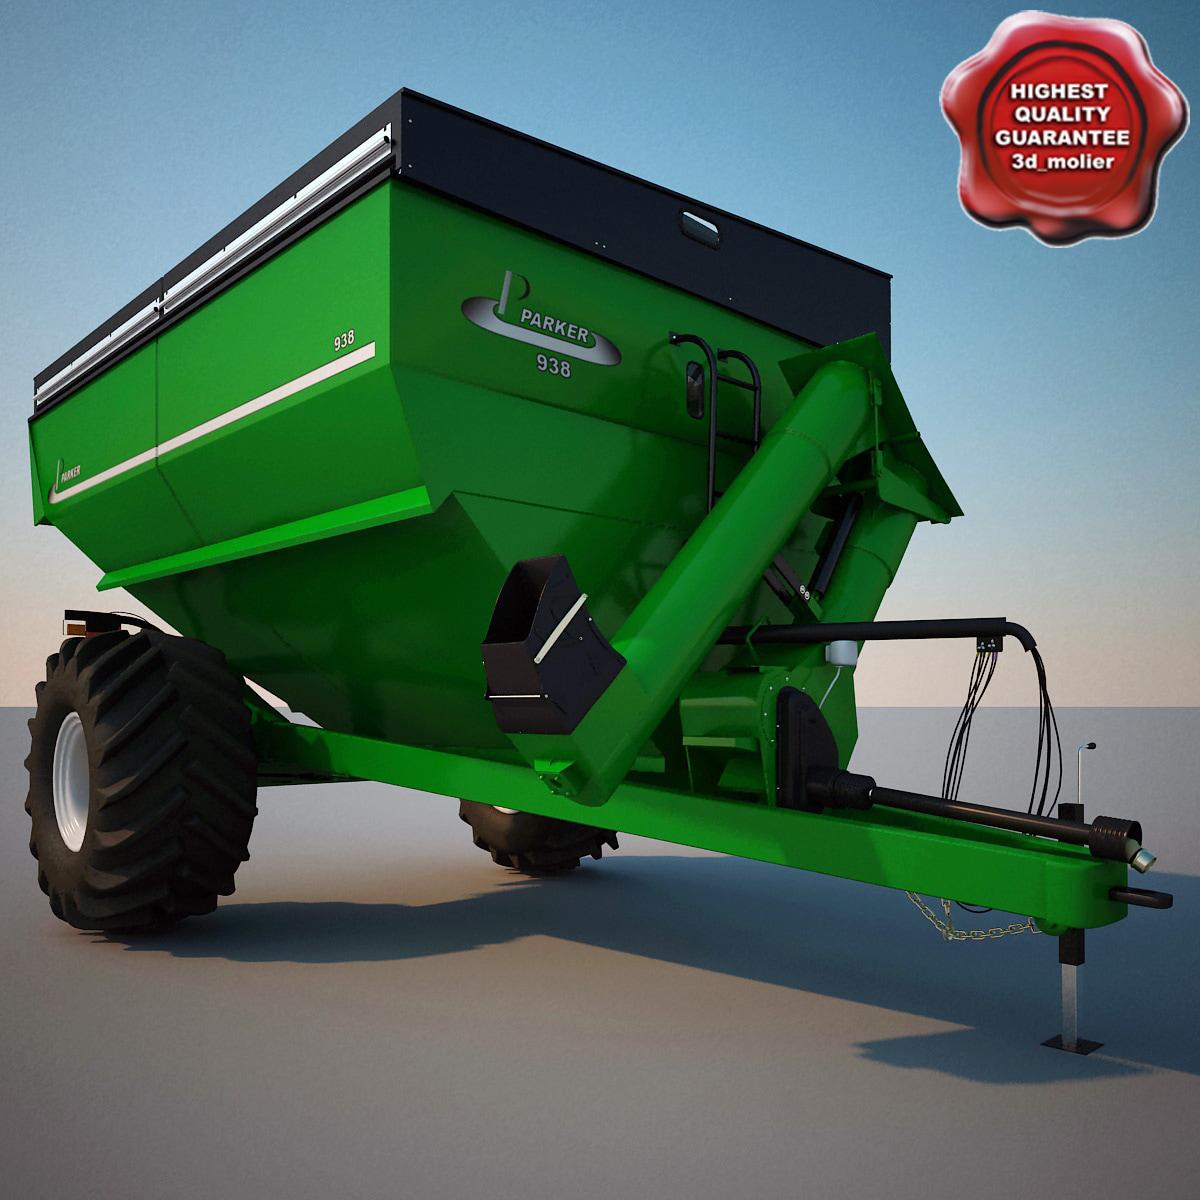 Farm_Grain_Cart_Parker_938_00.jpg